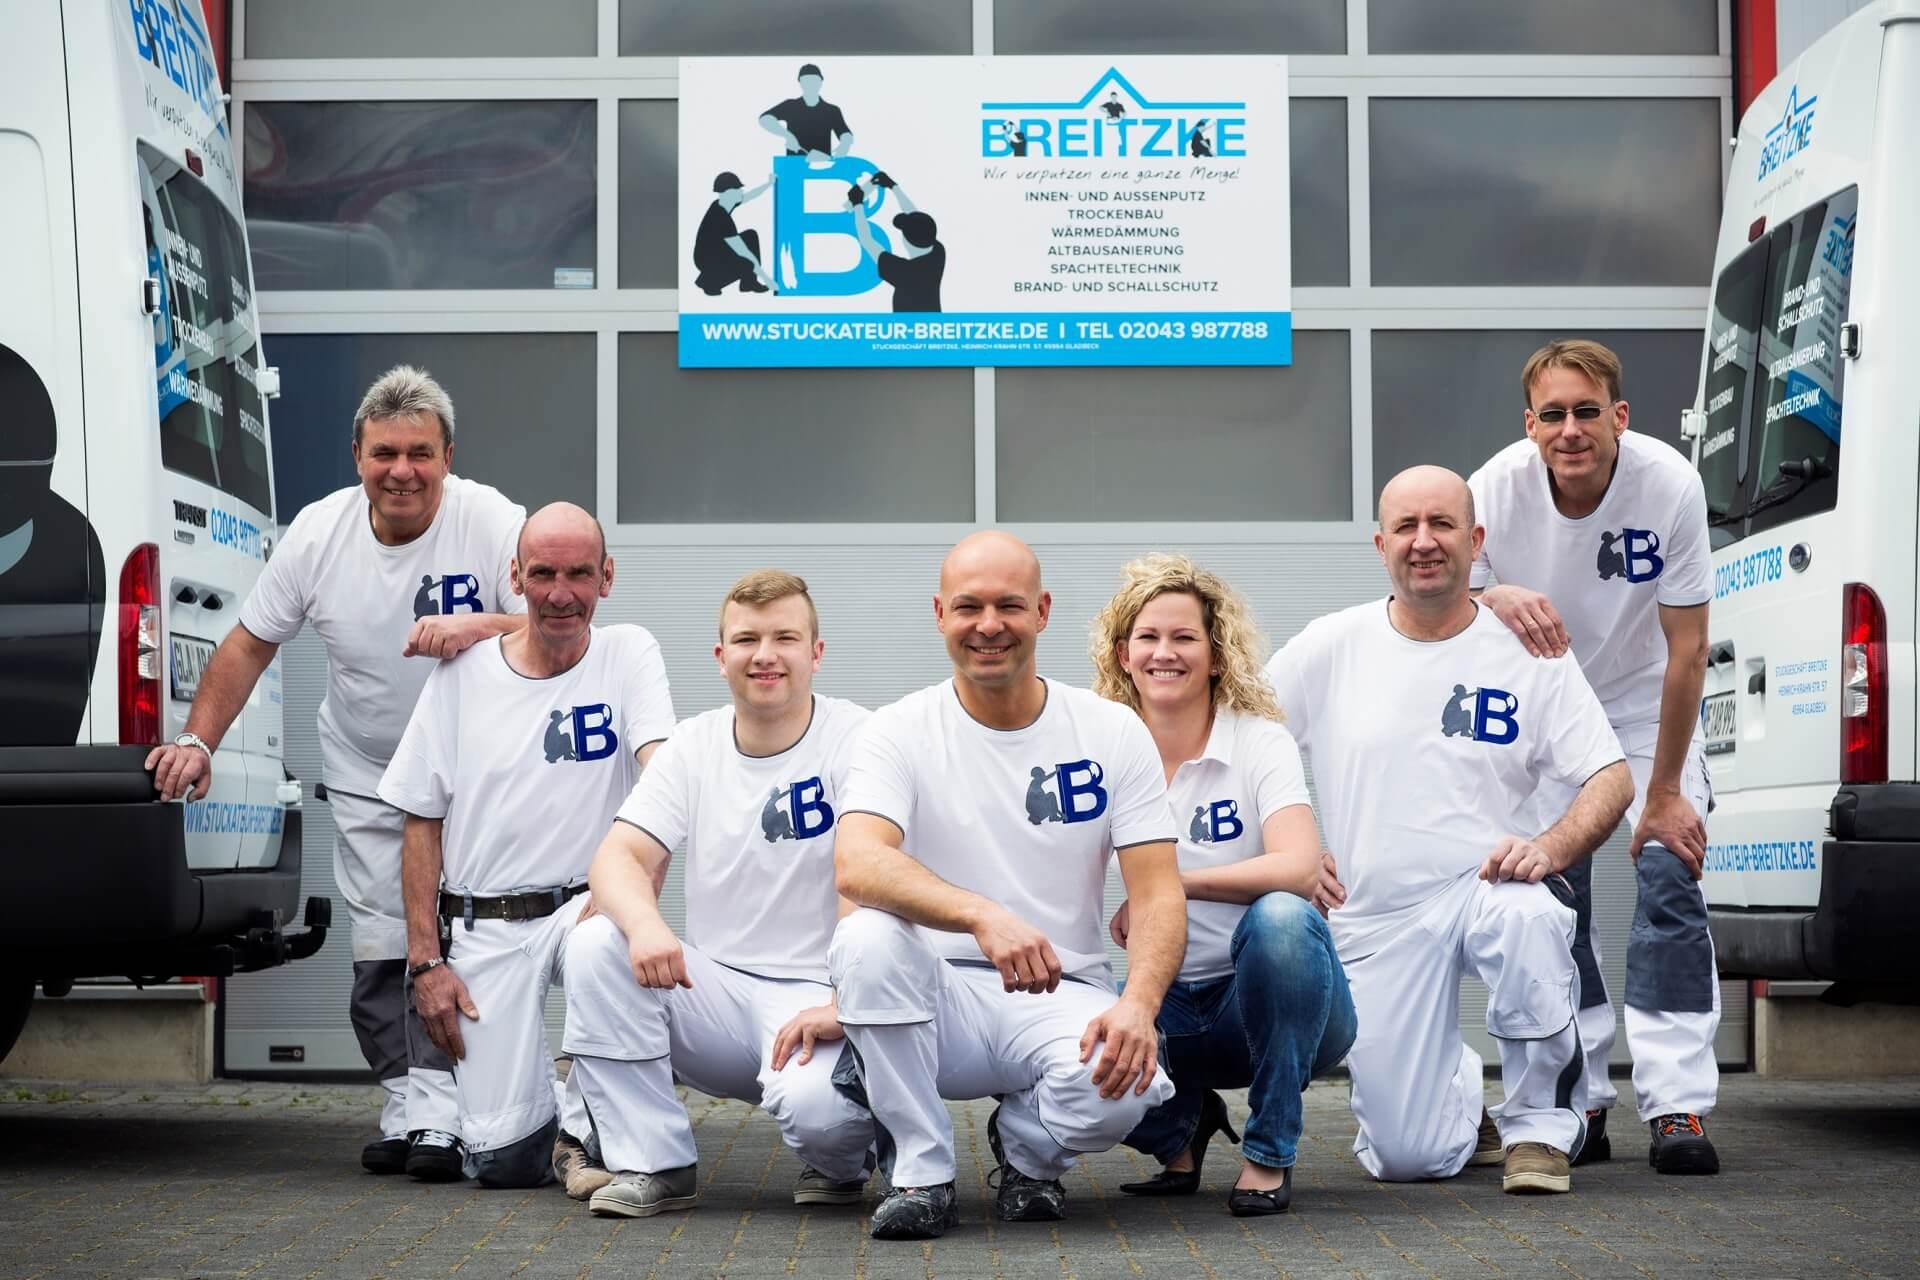 Stuckateur Breitzke Gladbeck Team